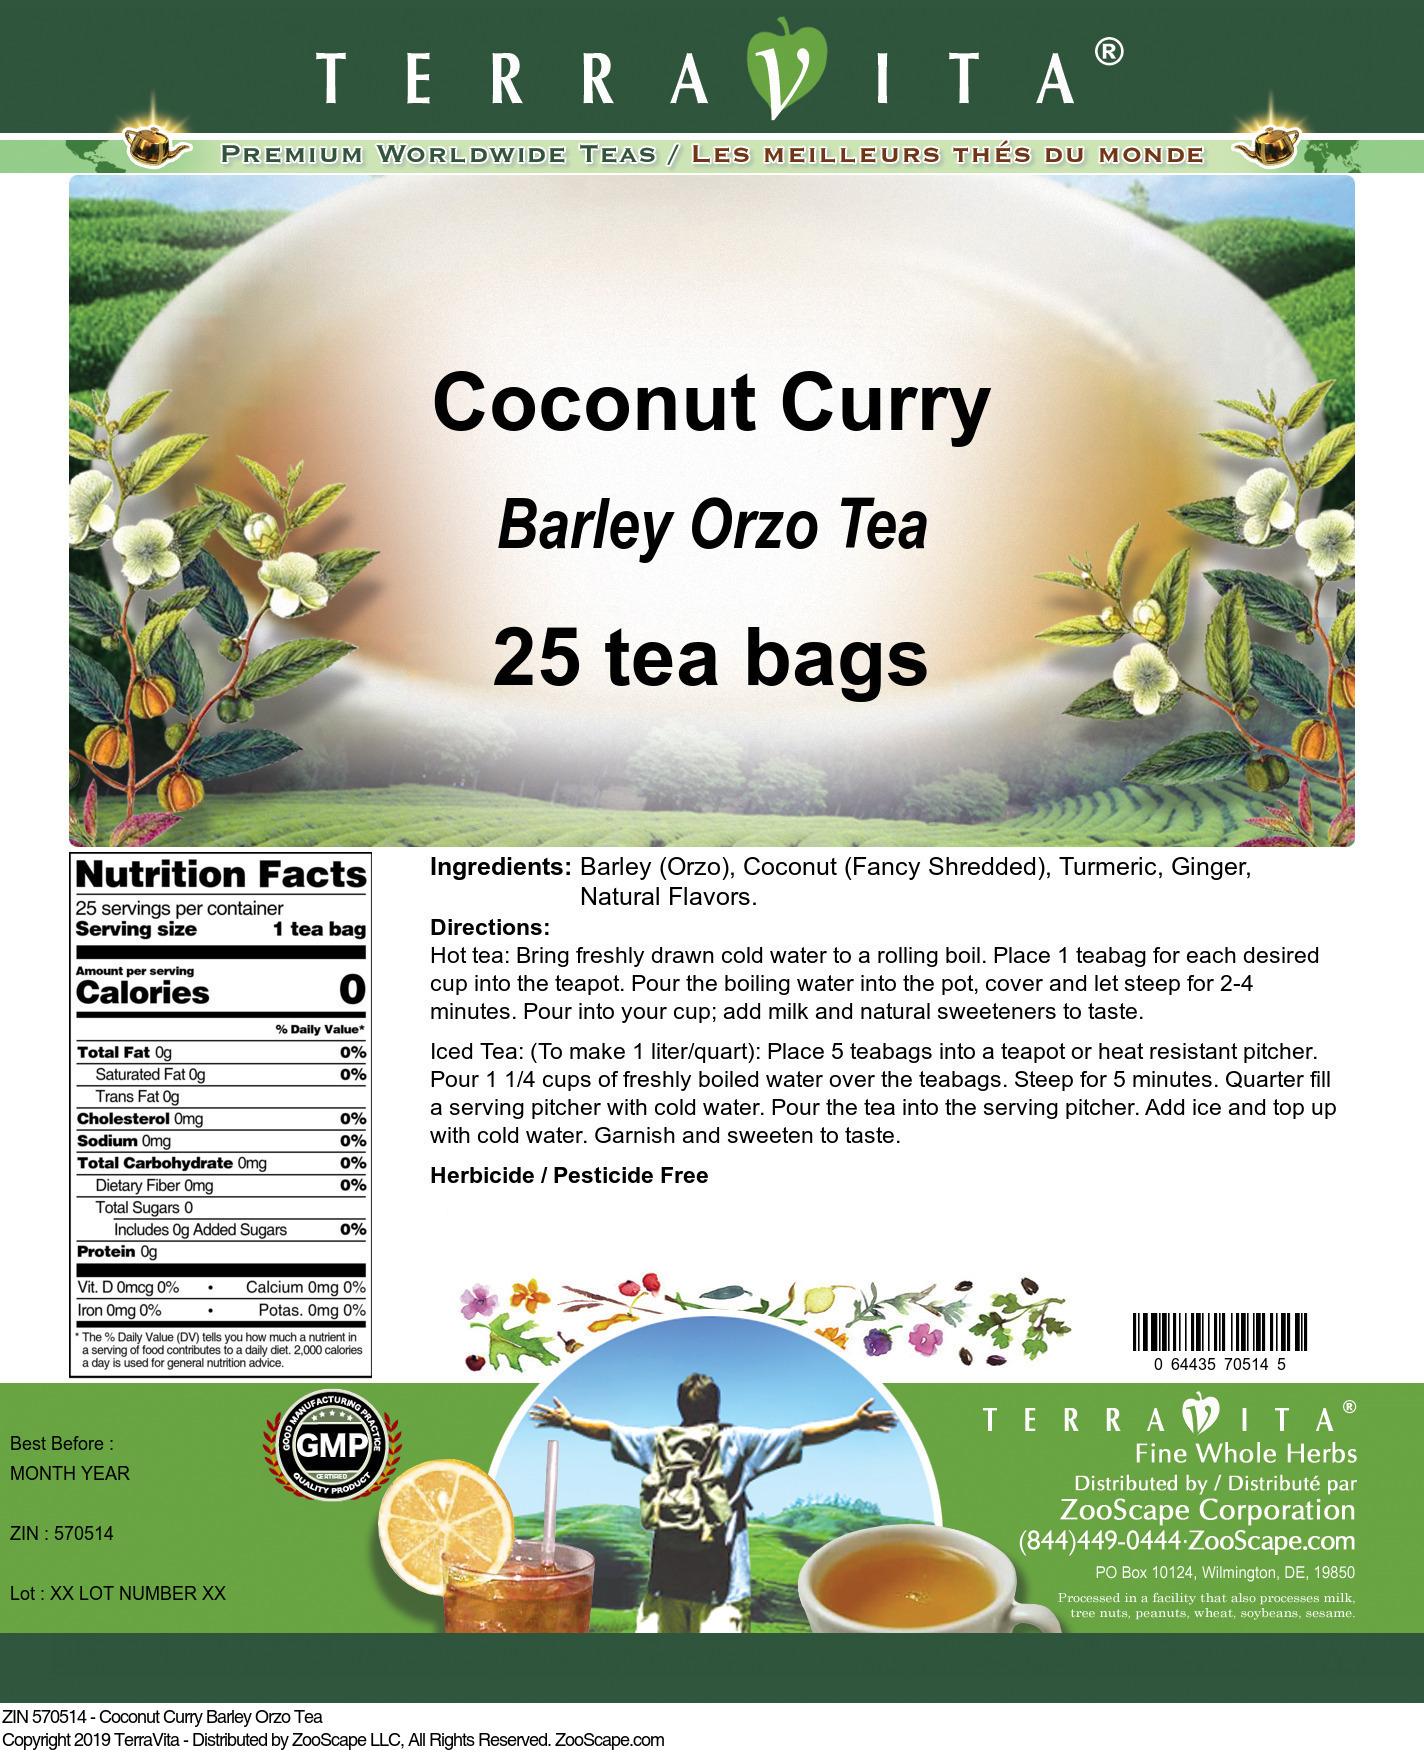 Coconut Curry Barley Orzo